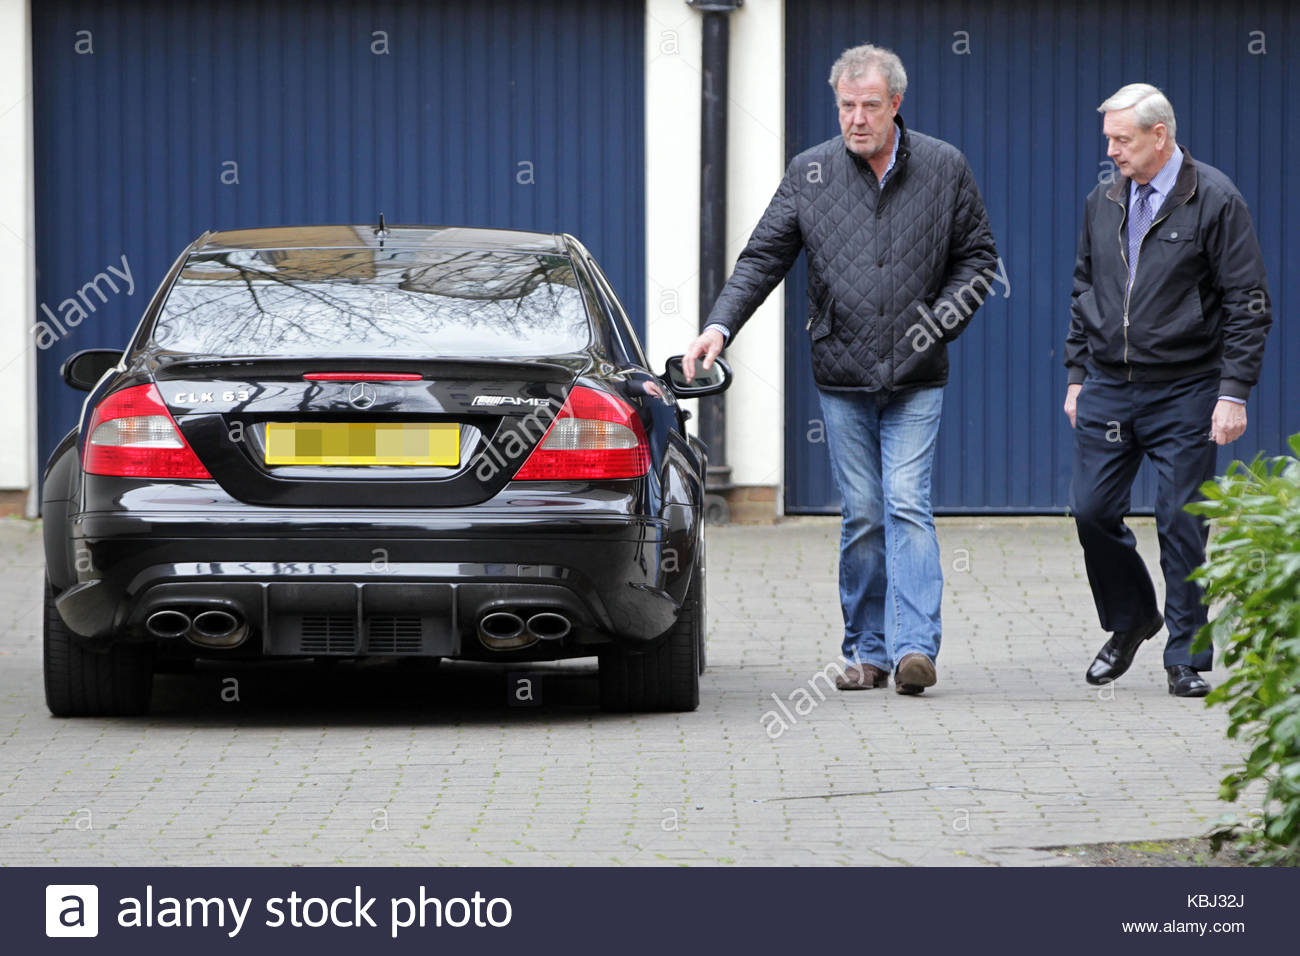 Jeremy Clarkson Cars: Clk Stock Photos & Clk Stock Images